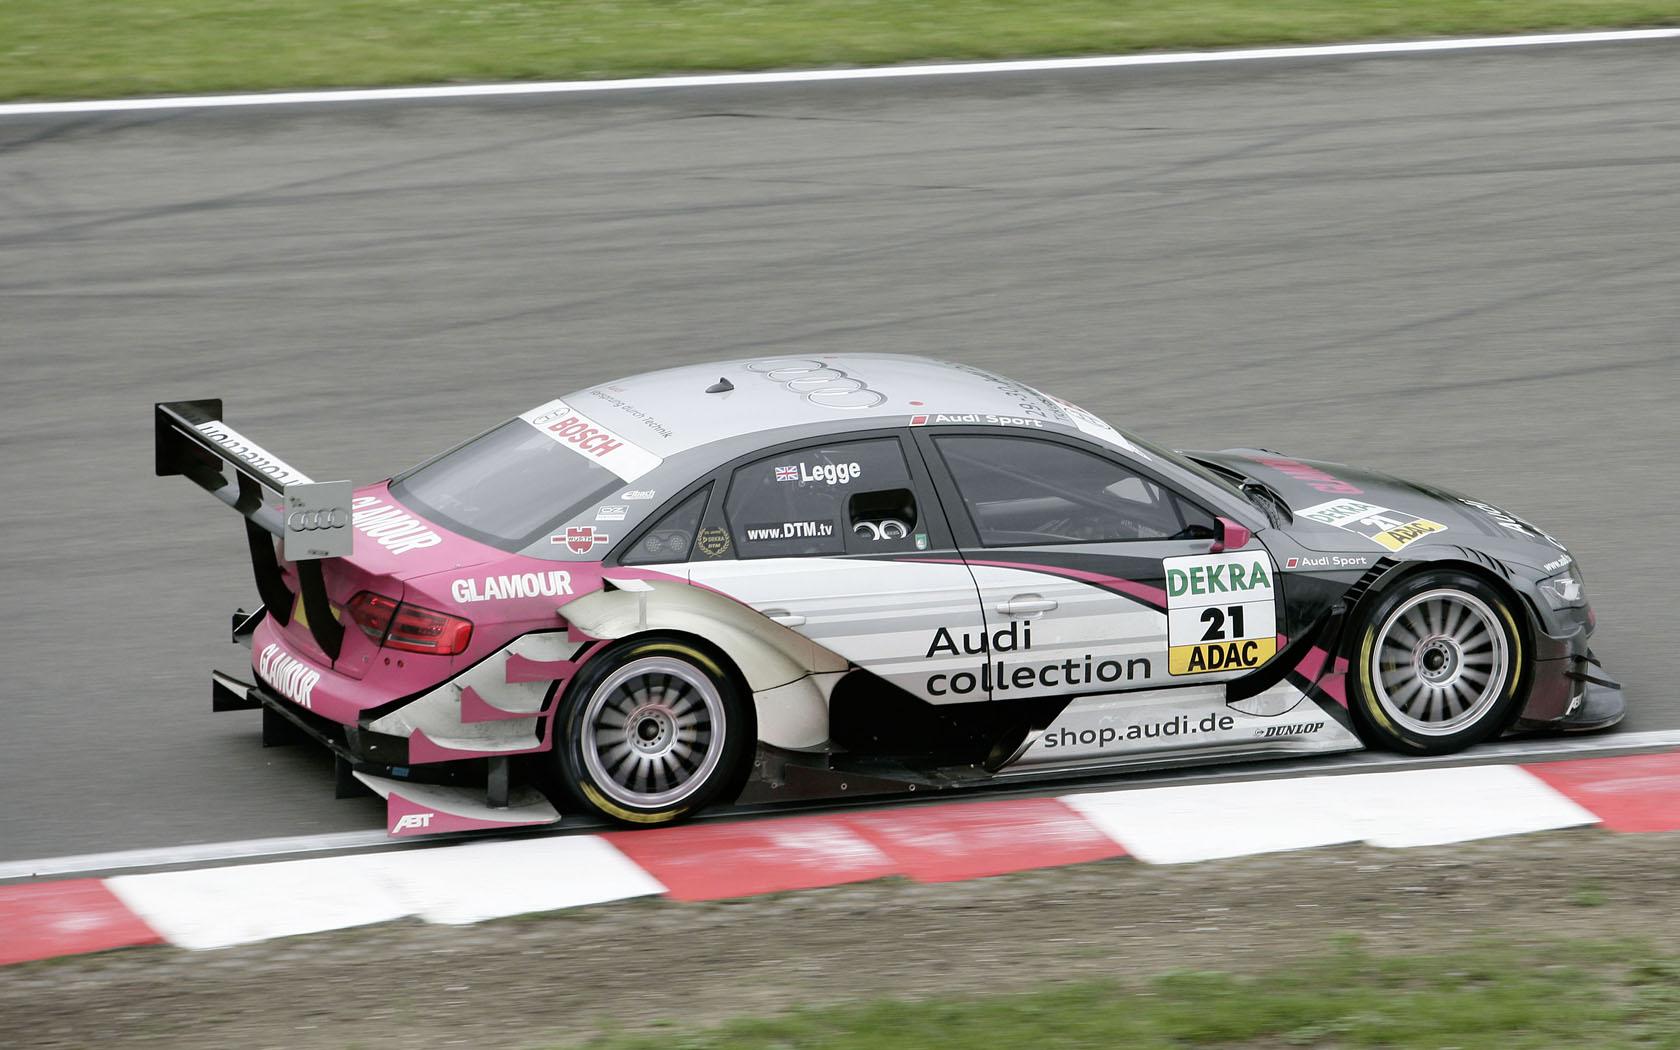 Audi A4 DTM photos - PhotoGallery with 82 pics  CarsBase.com